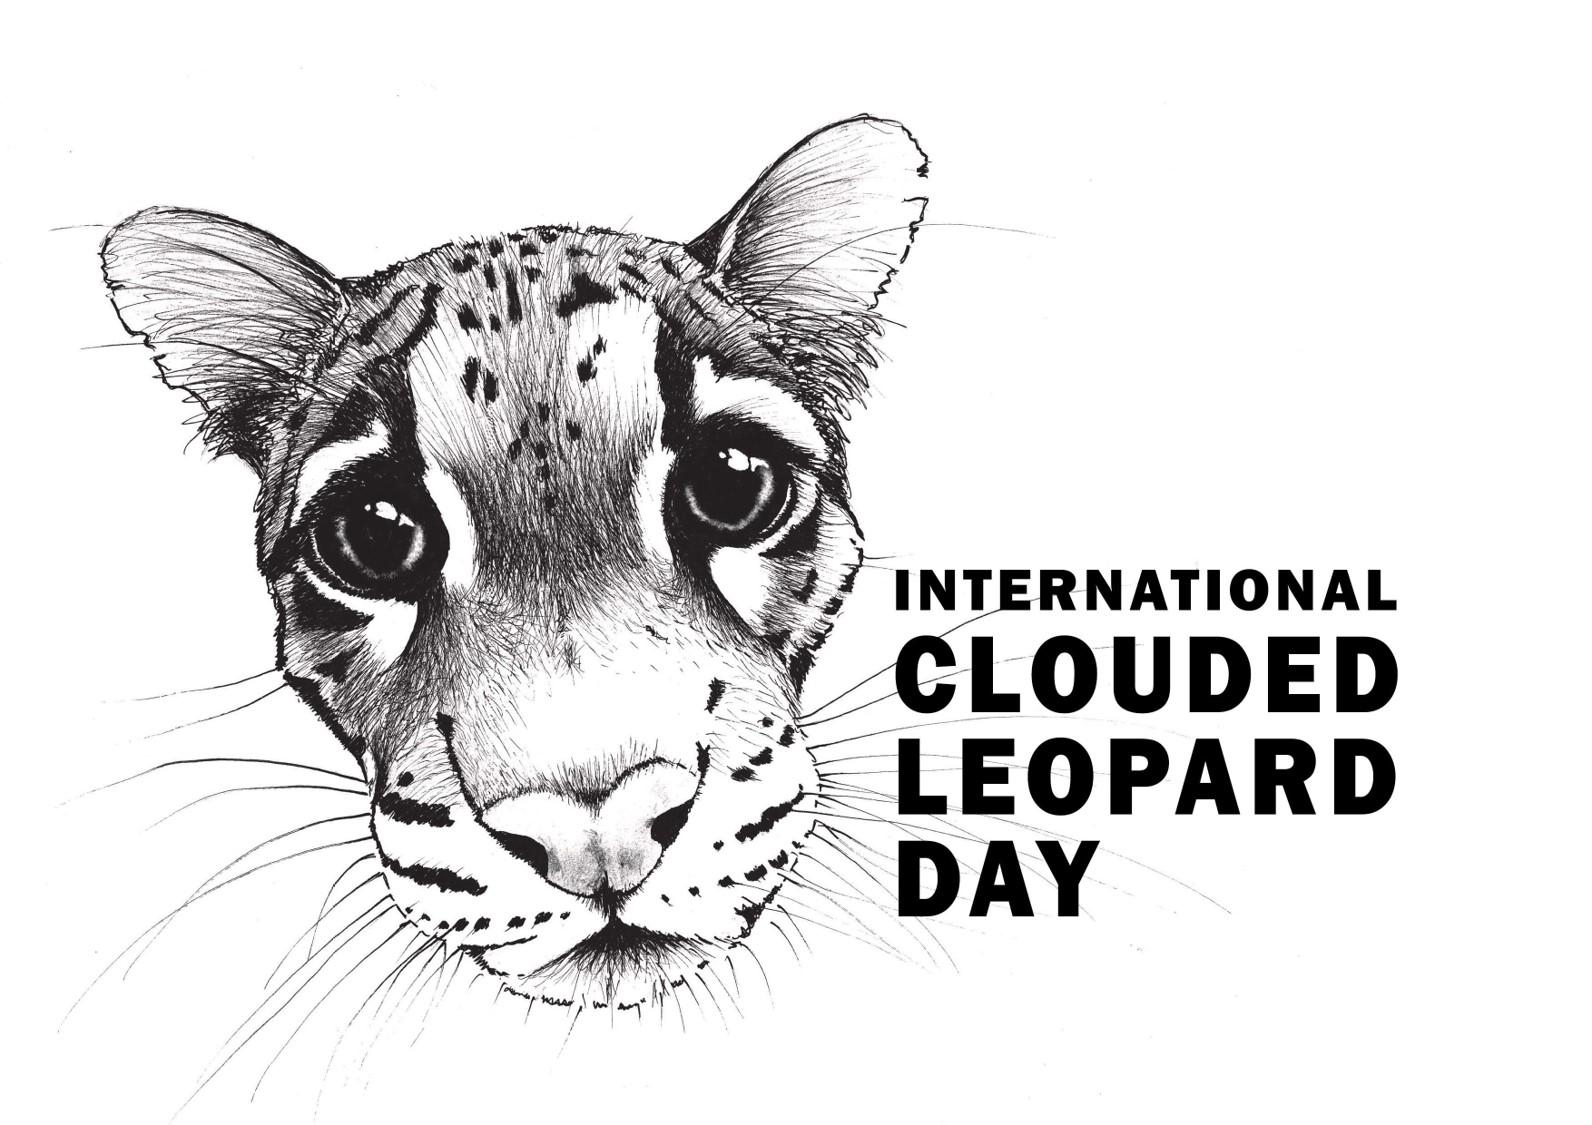 Clouded-leopard-aspinal-howlett-wanicare-cikananga.png